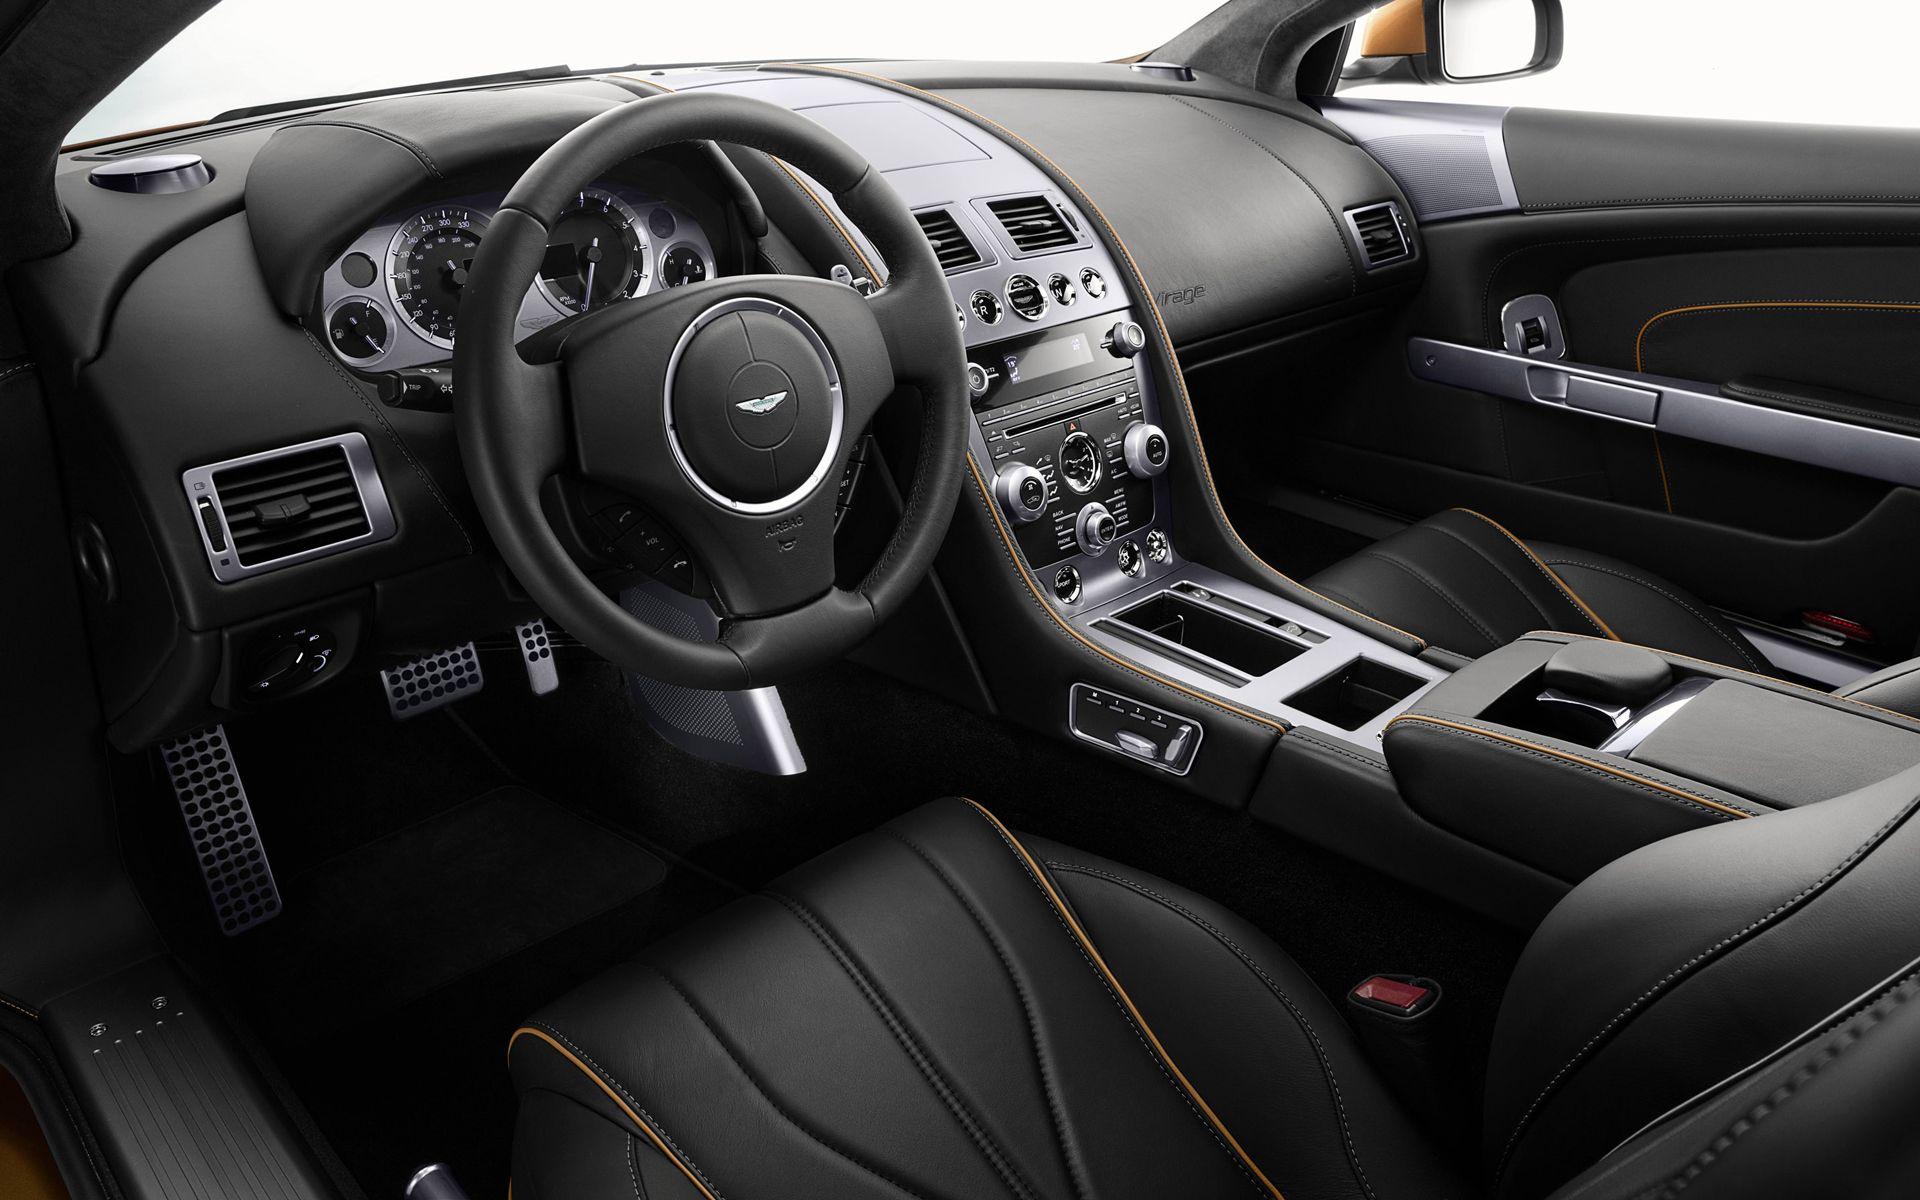 aston martin v12 zagato black leather interior | cars - aston